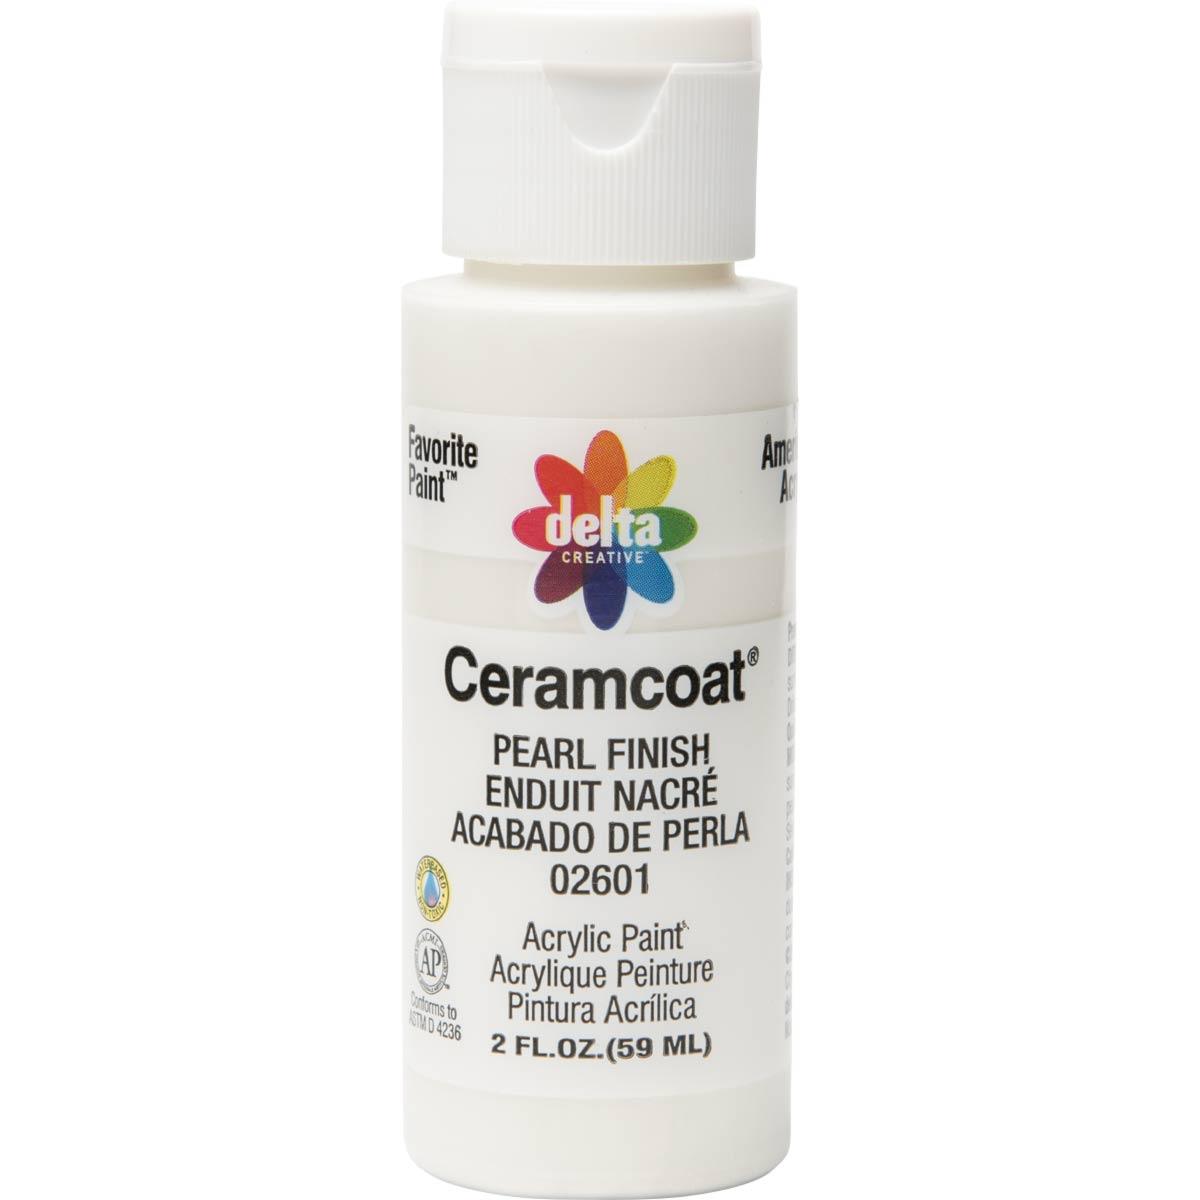 Delta Ceramcoat ® Acrylic Paint - Pearl Finish, 2 oz. - 026010202W